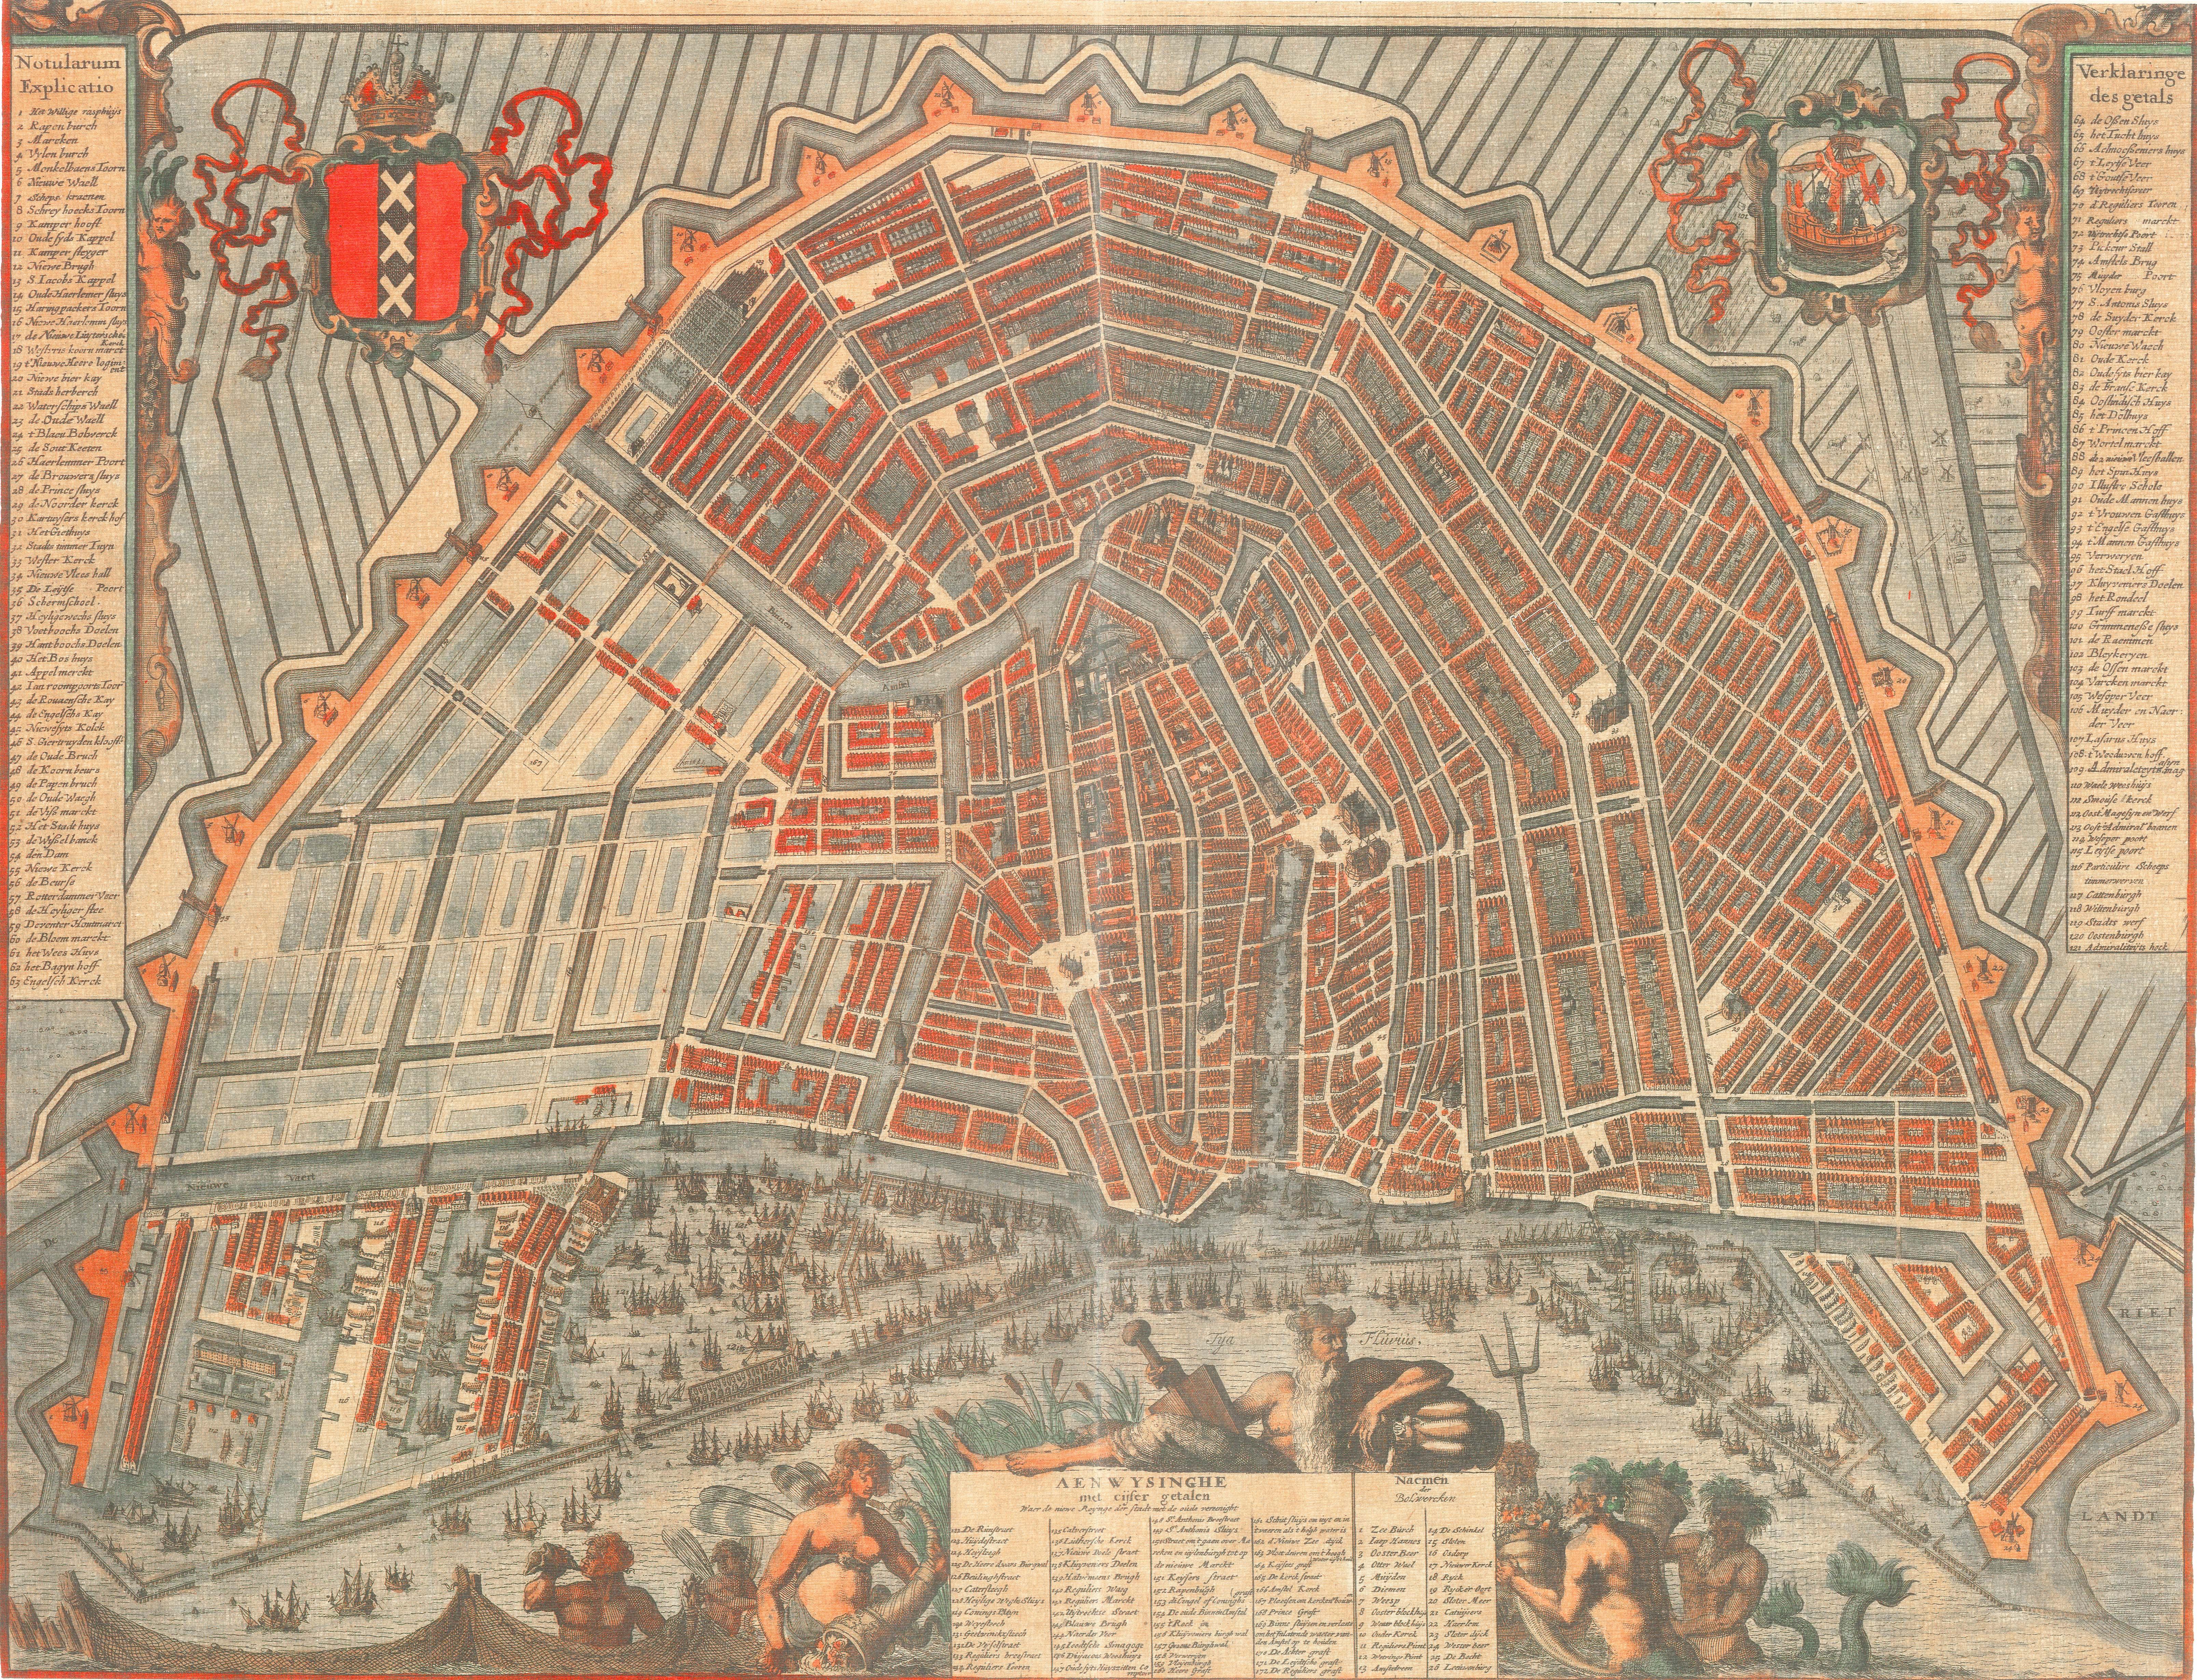 FileAmsterdamjpg Wikimedia Commons - Amsterdam old map